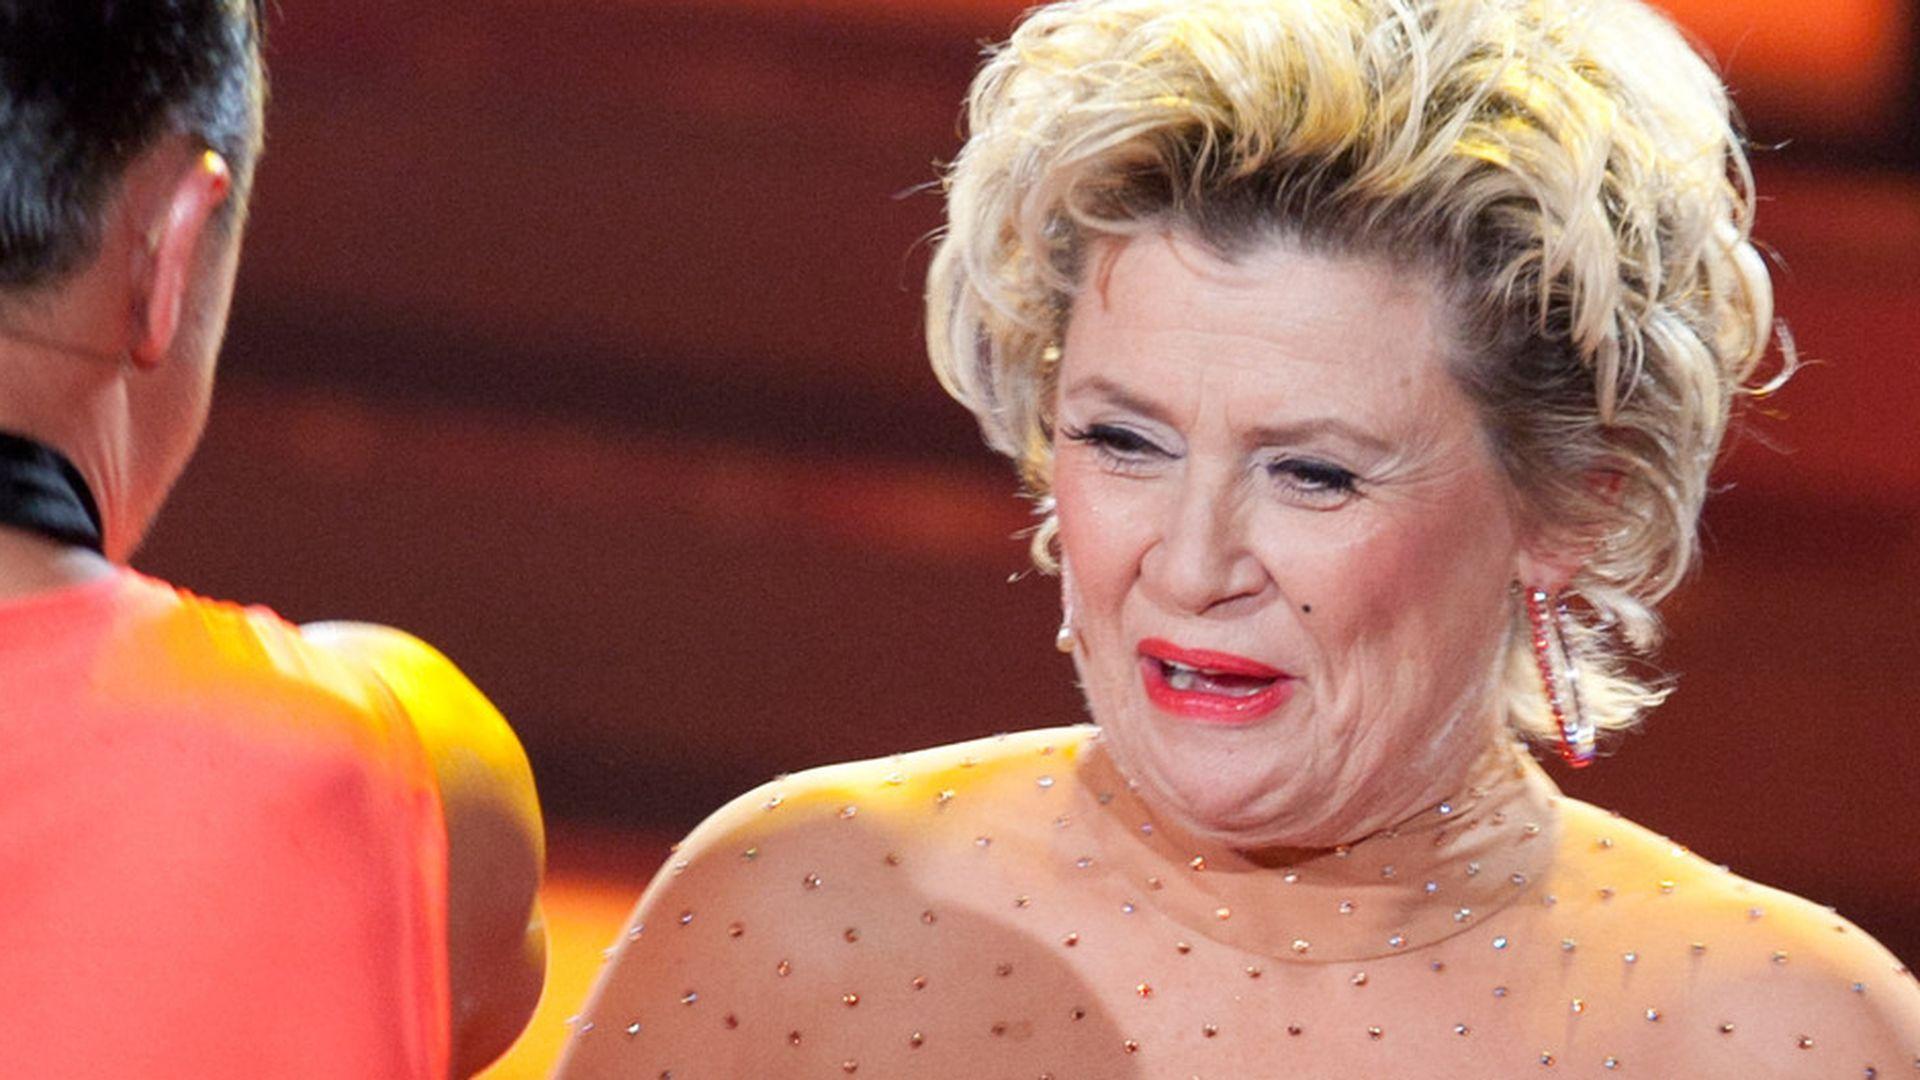 Gitte Haenning: Wegen todkranker Schwester weiter